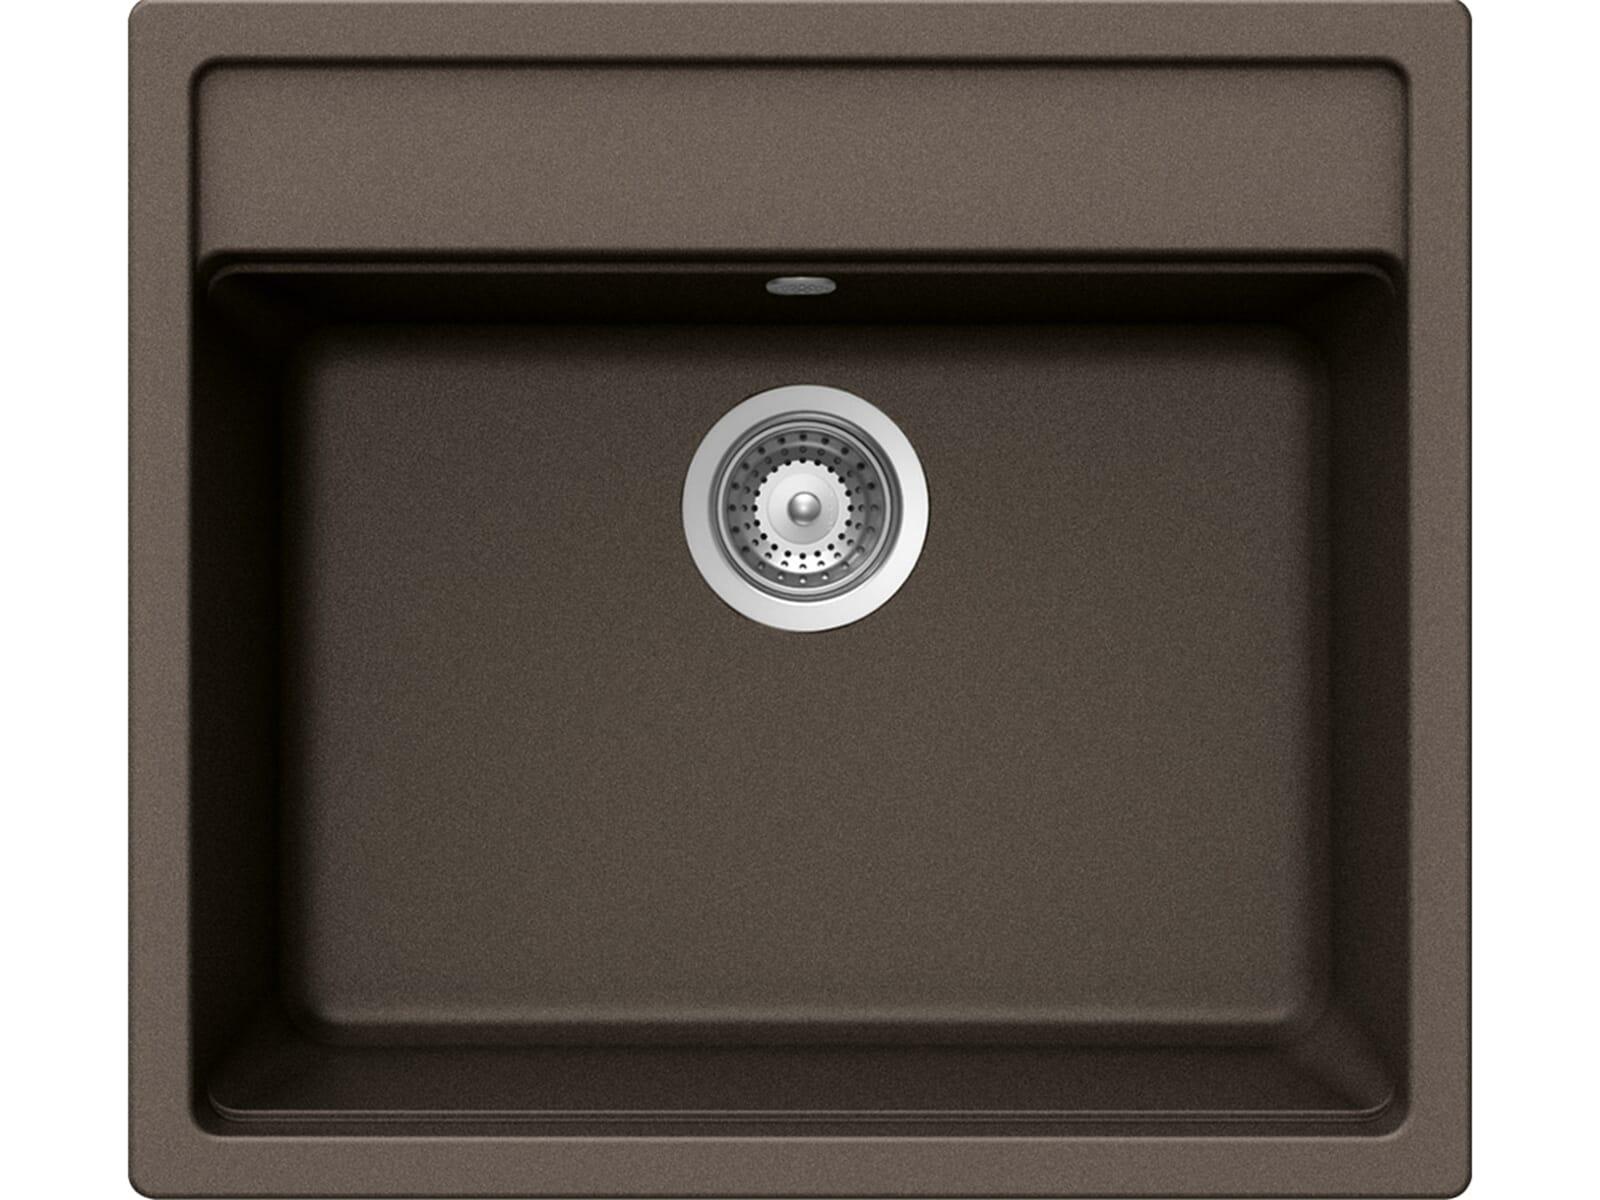 cristadur sp le schock mono n 100 a bronze grau braun ebay. Black Bedroom Furniture Sets. Home Design Ideas